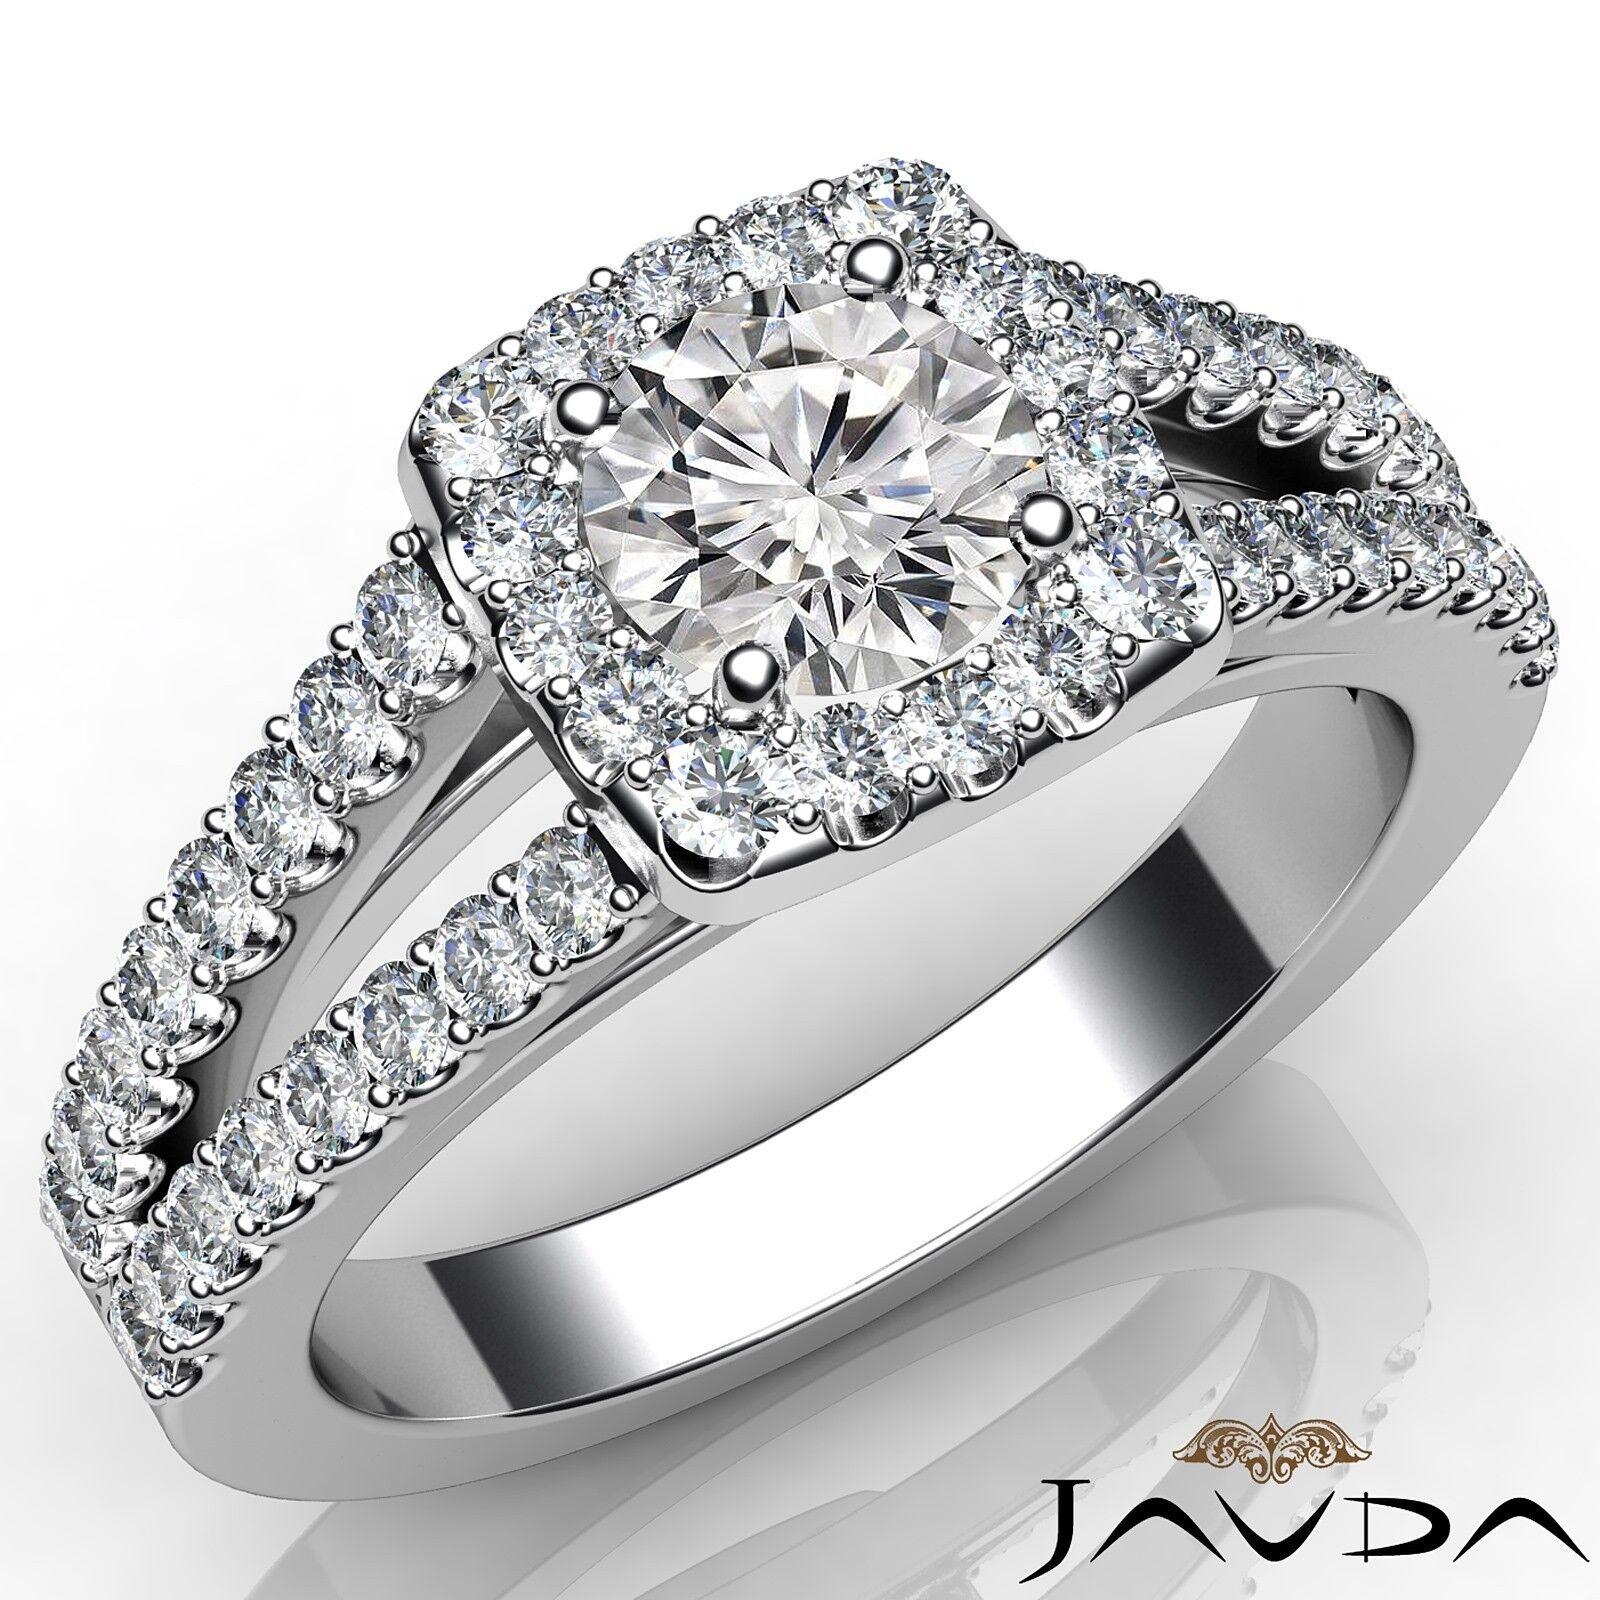 1.2ctw U Cut Prong Set Round Diamond Engagement Ring GIA F-SI1 White Gold Rings